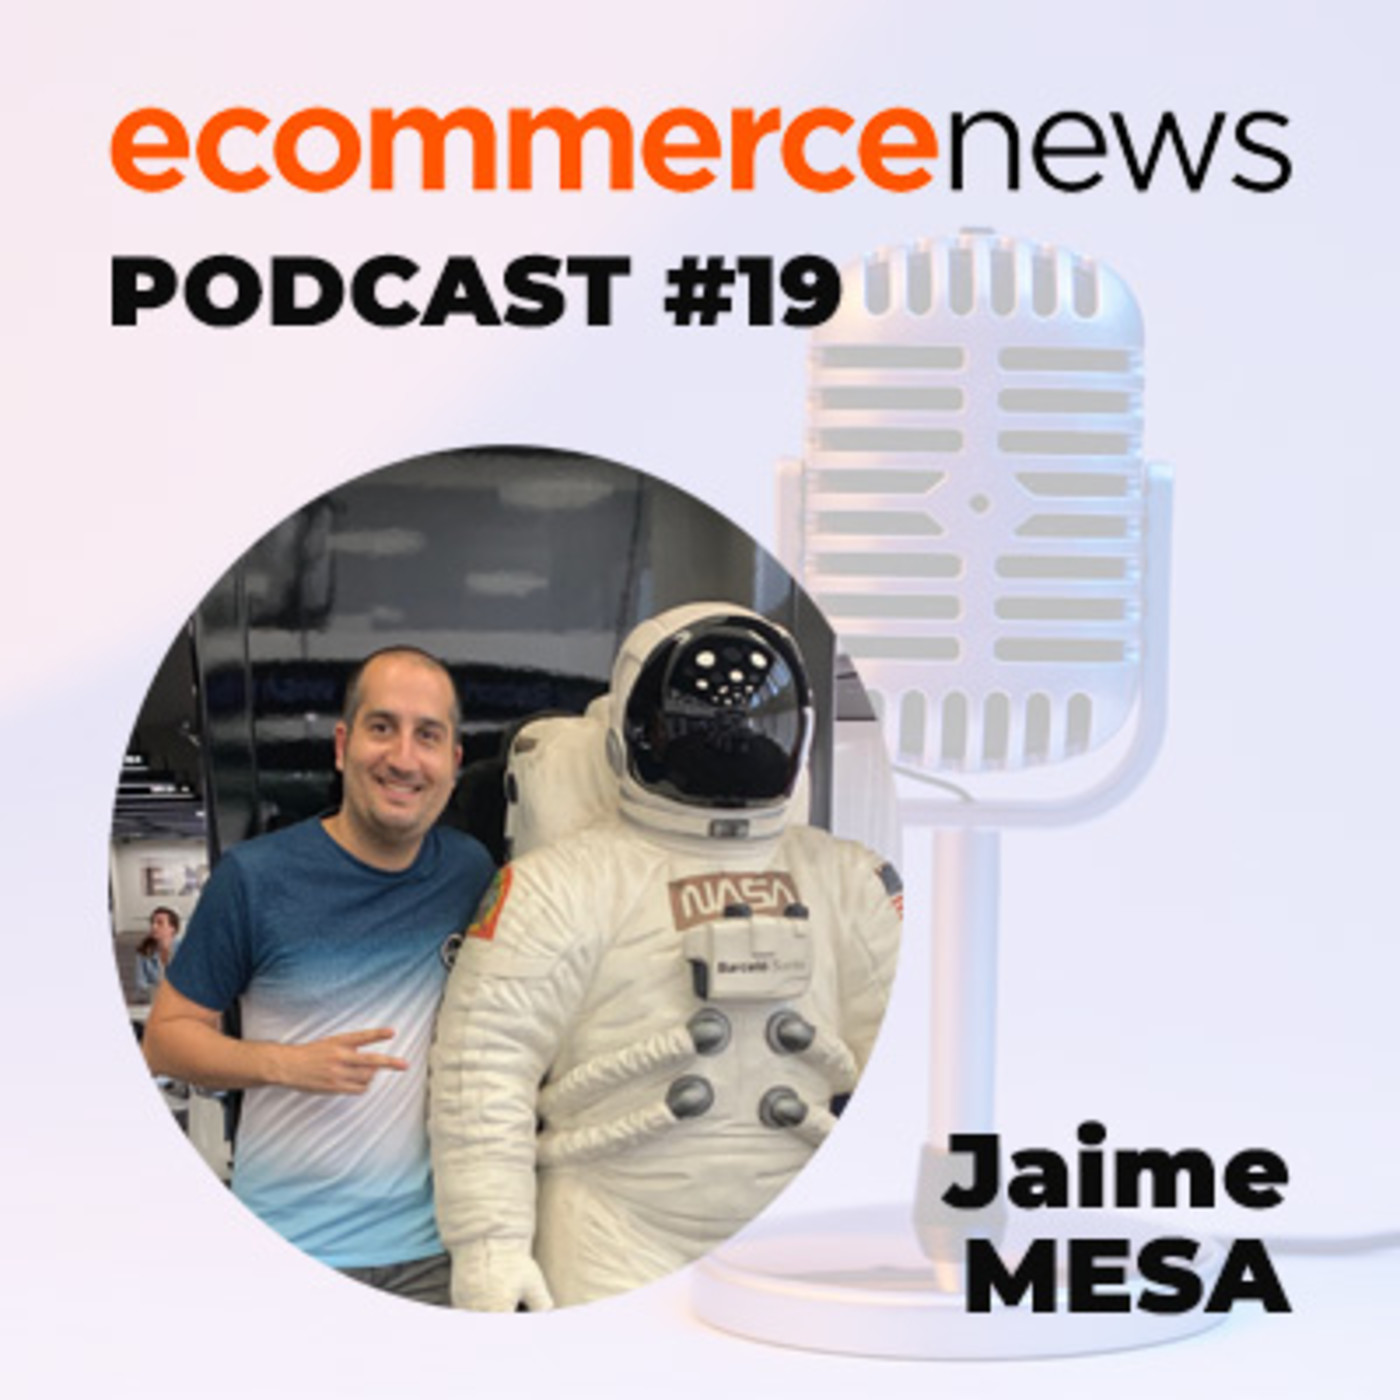 Ecommerce News Radio #19: Entrevista a Jaime Mesa, creador de EcommPills